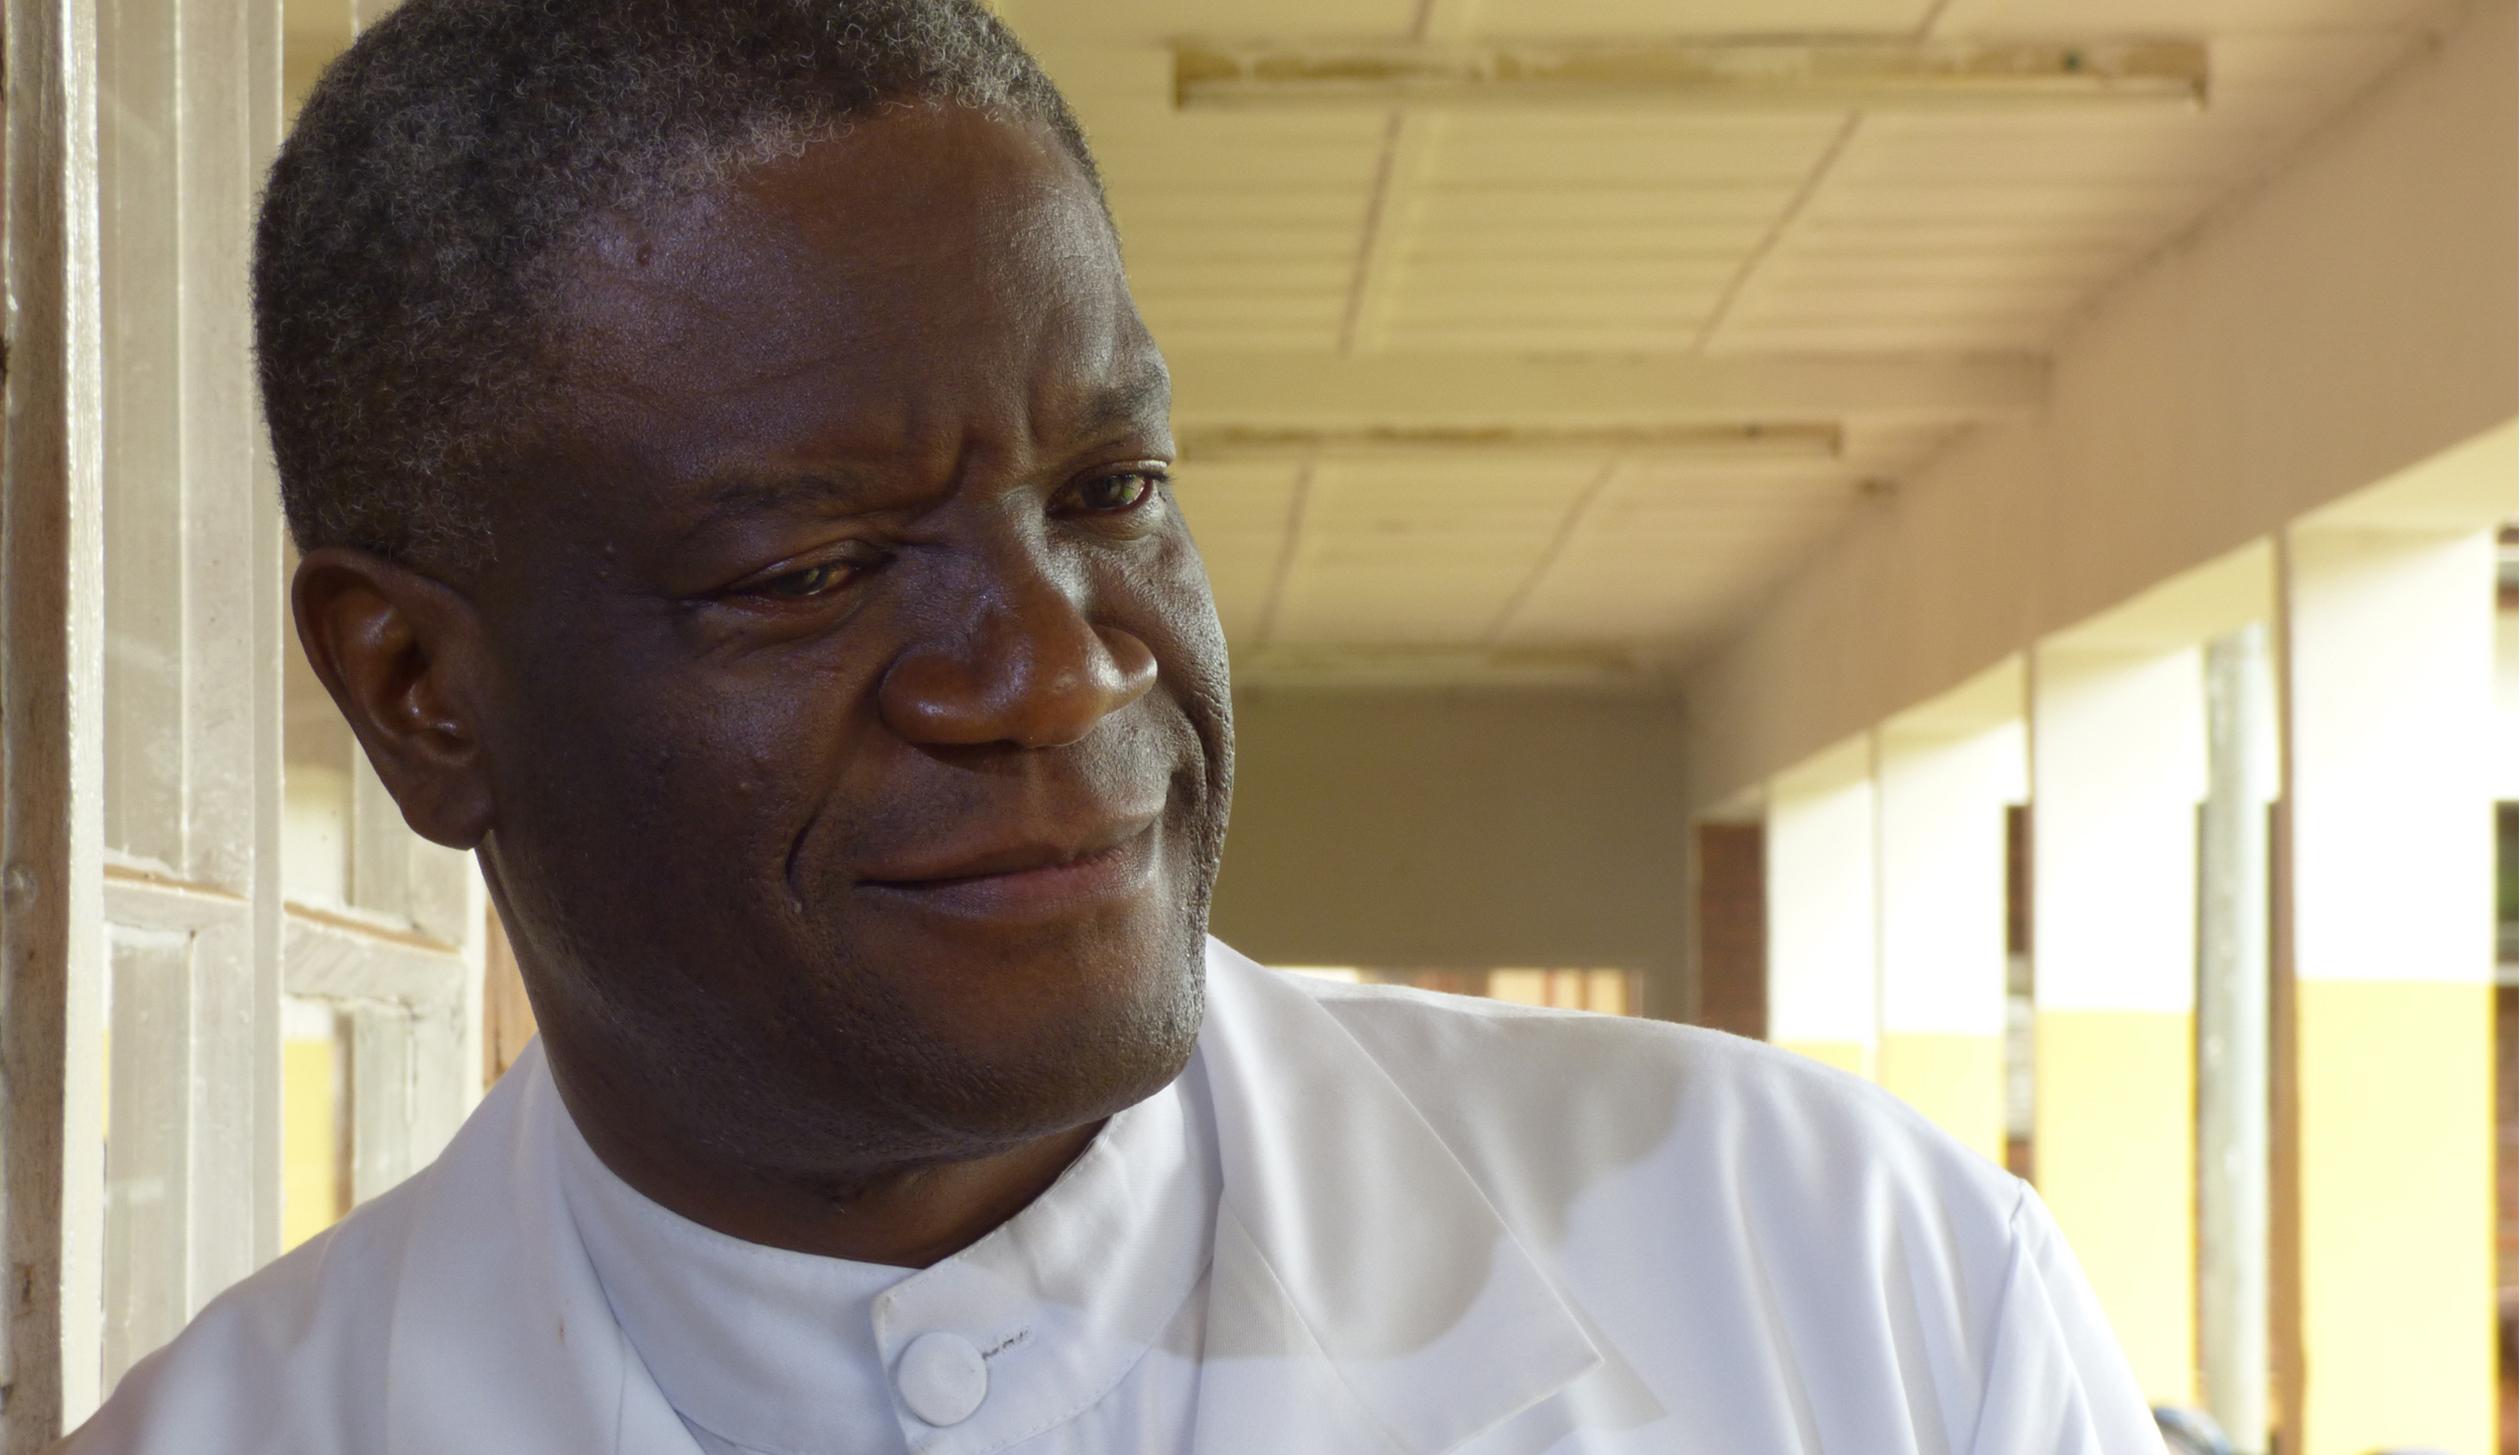 Portrait of Dr. Denis Mukwege.